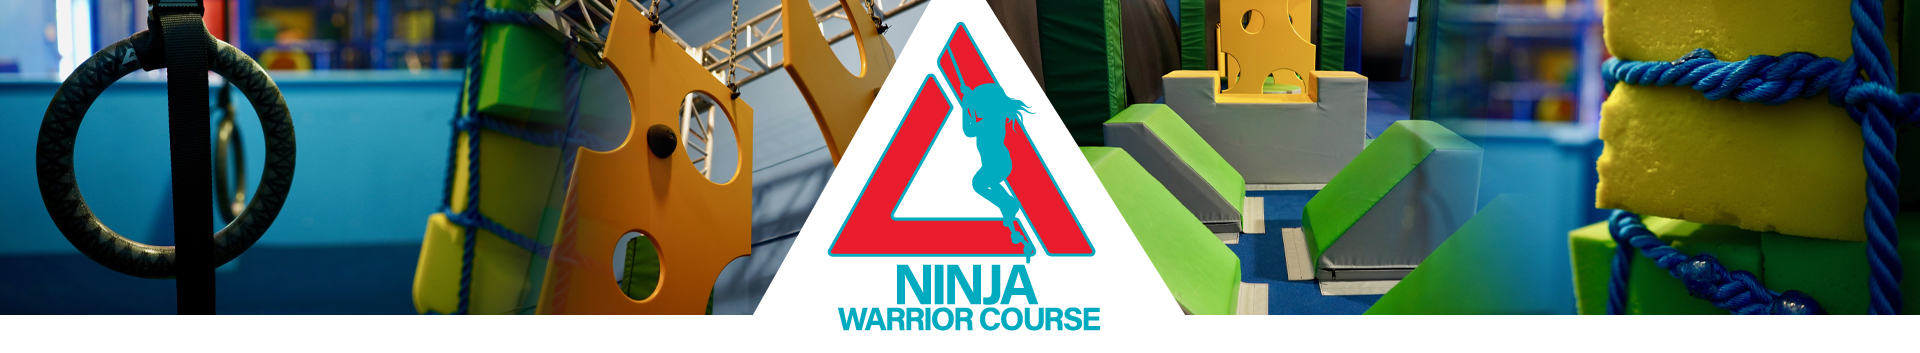 ninja warrior course